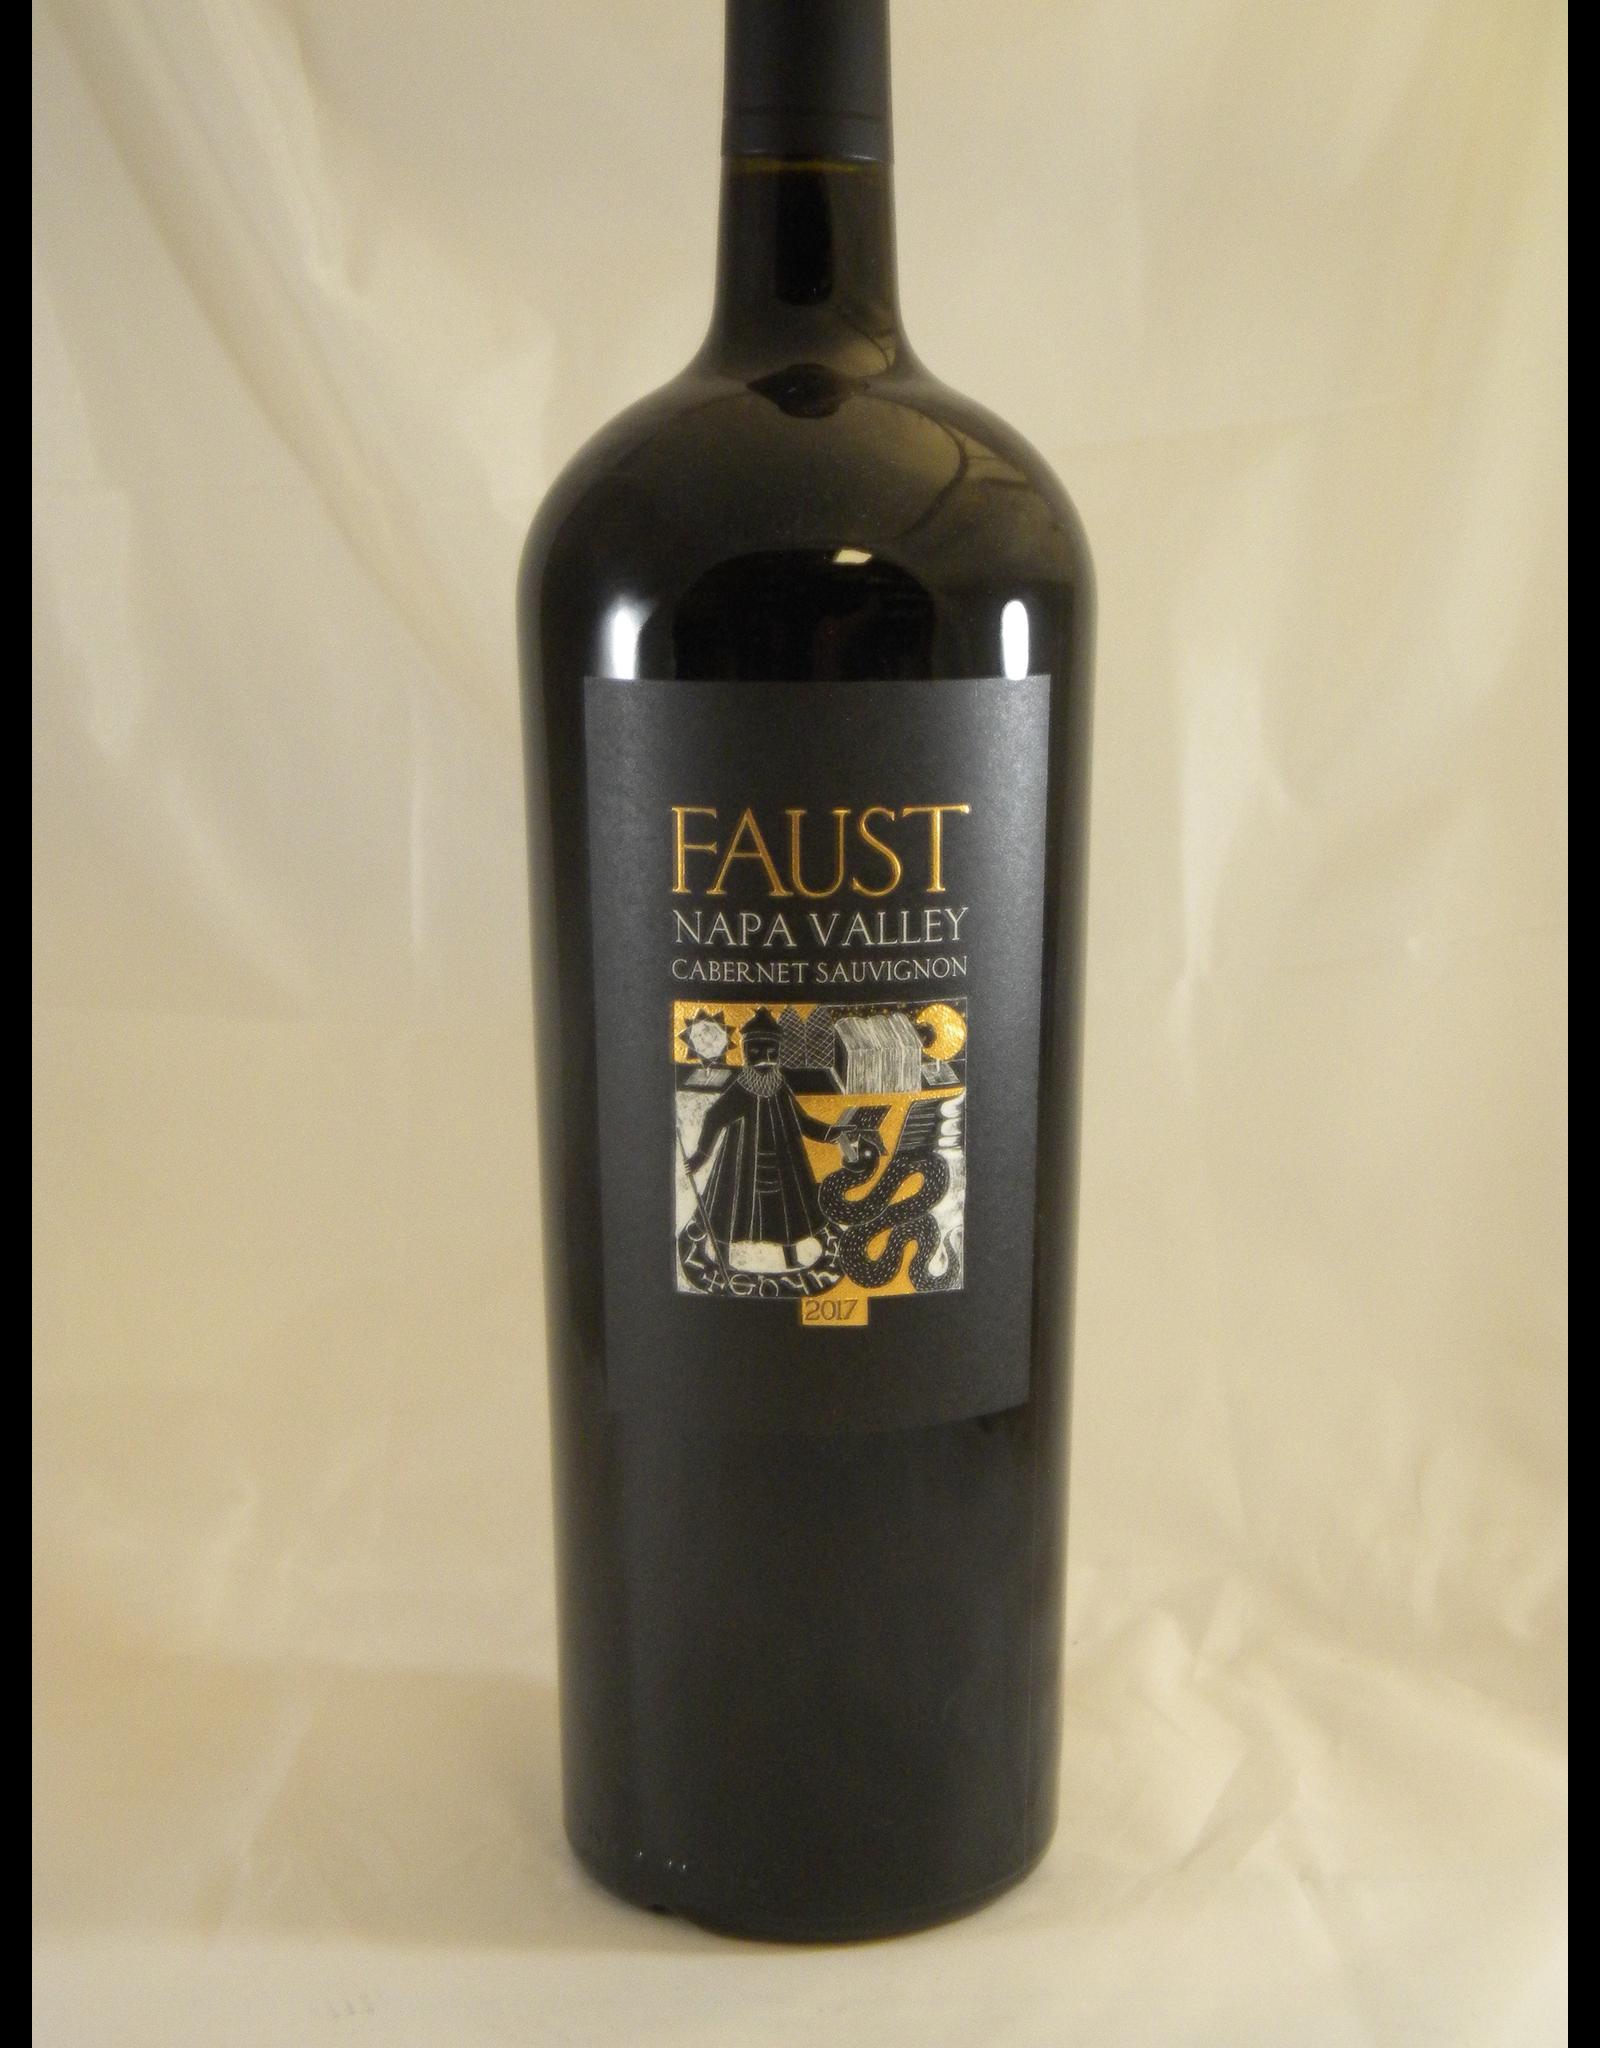 Faust Faust Cabernet Napa Magnum 2017